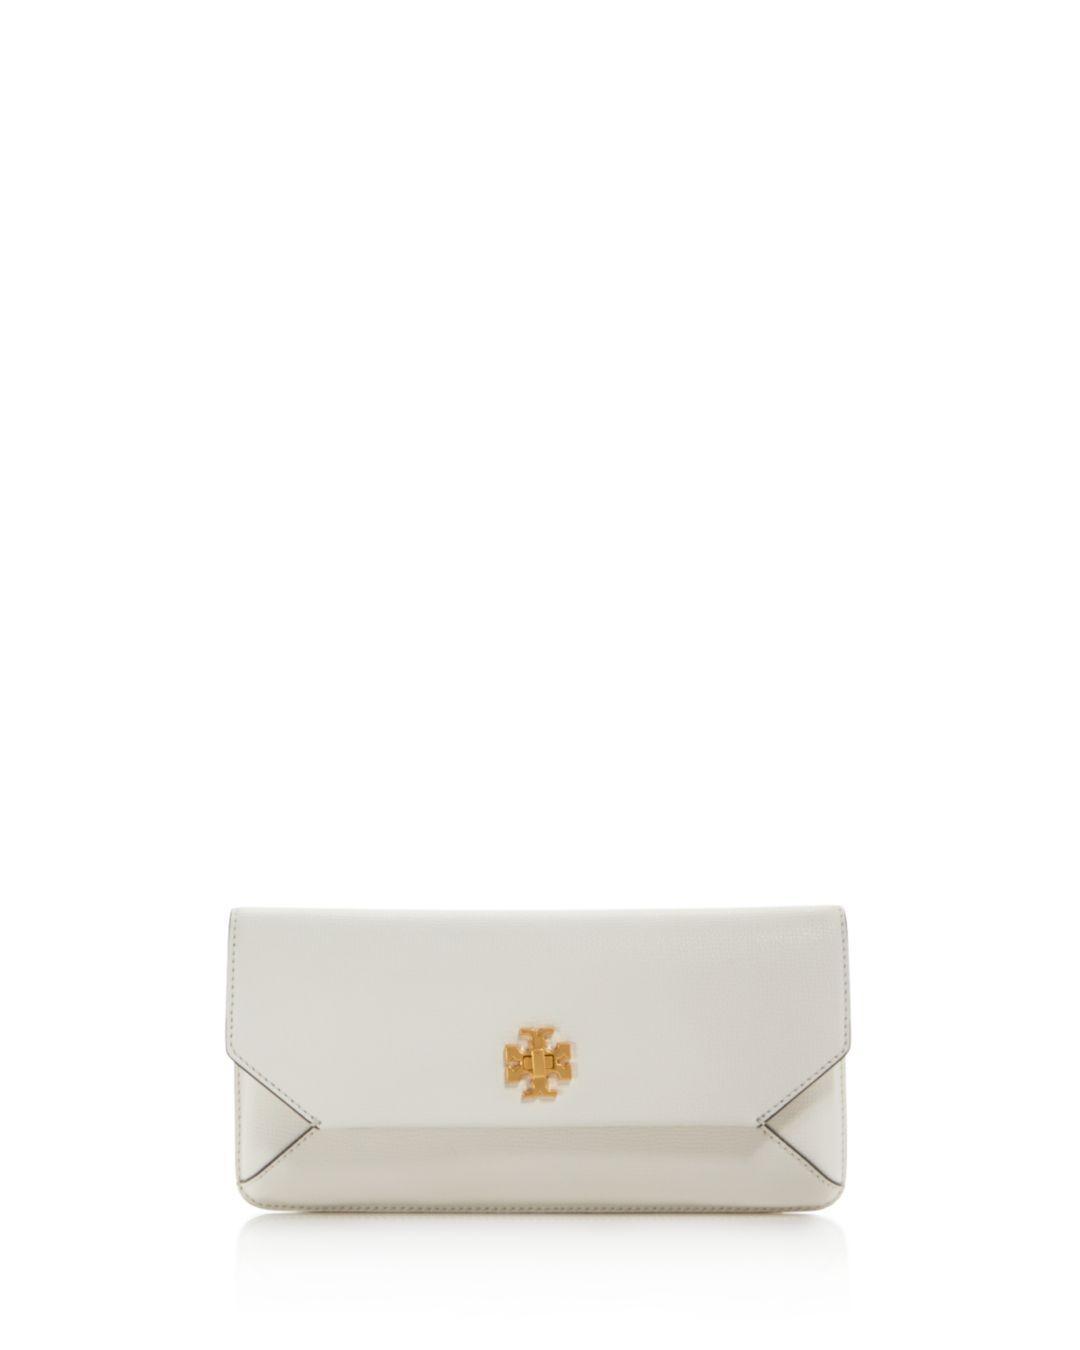 ca3e0b6291ad Tory Burch. Women s Kira Leather Envelope Clutch